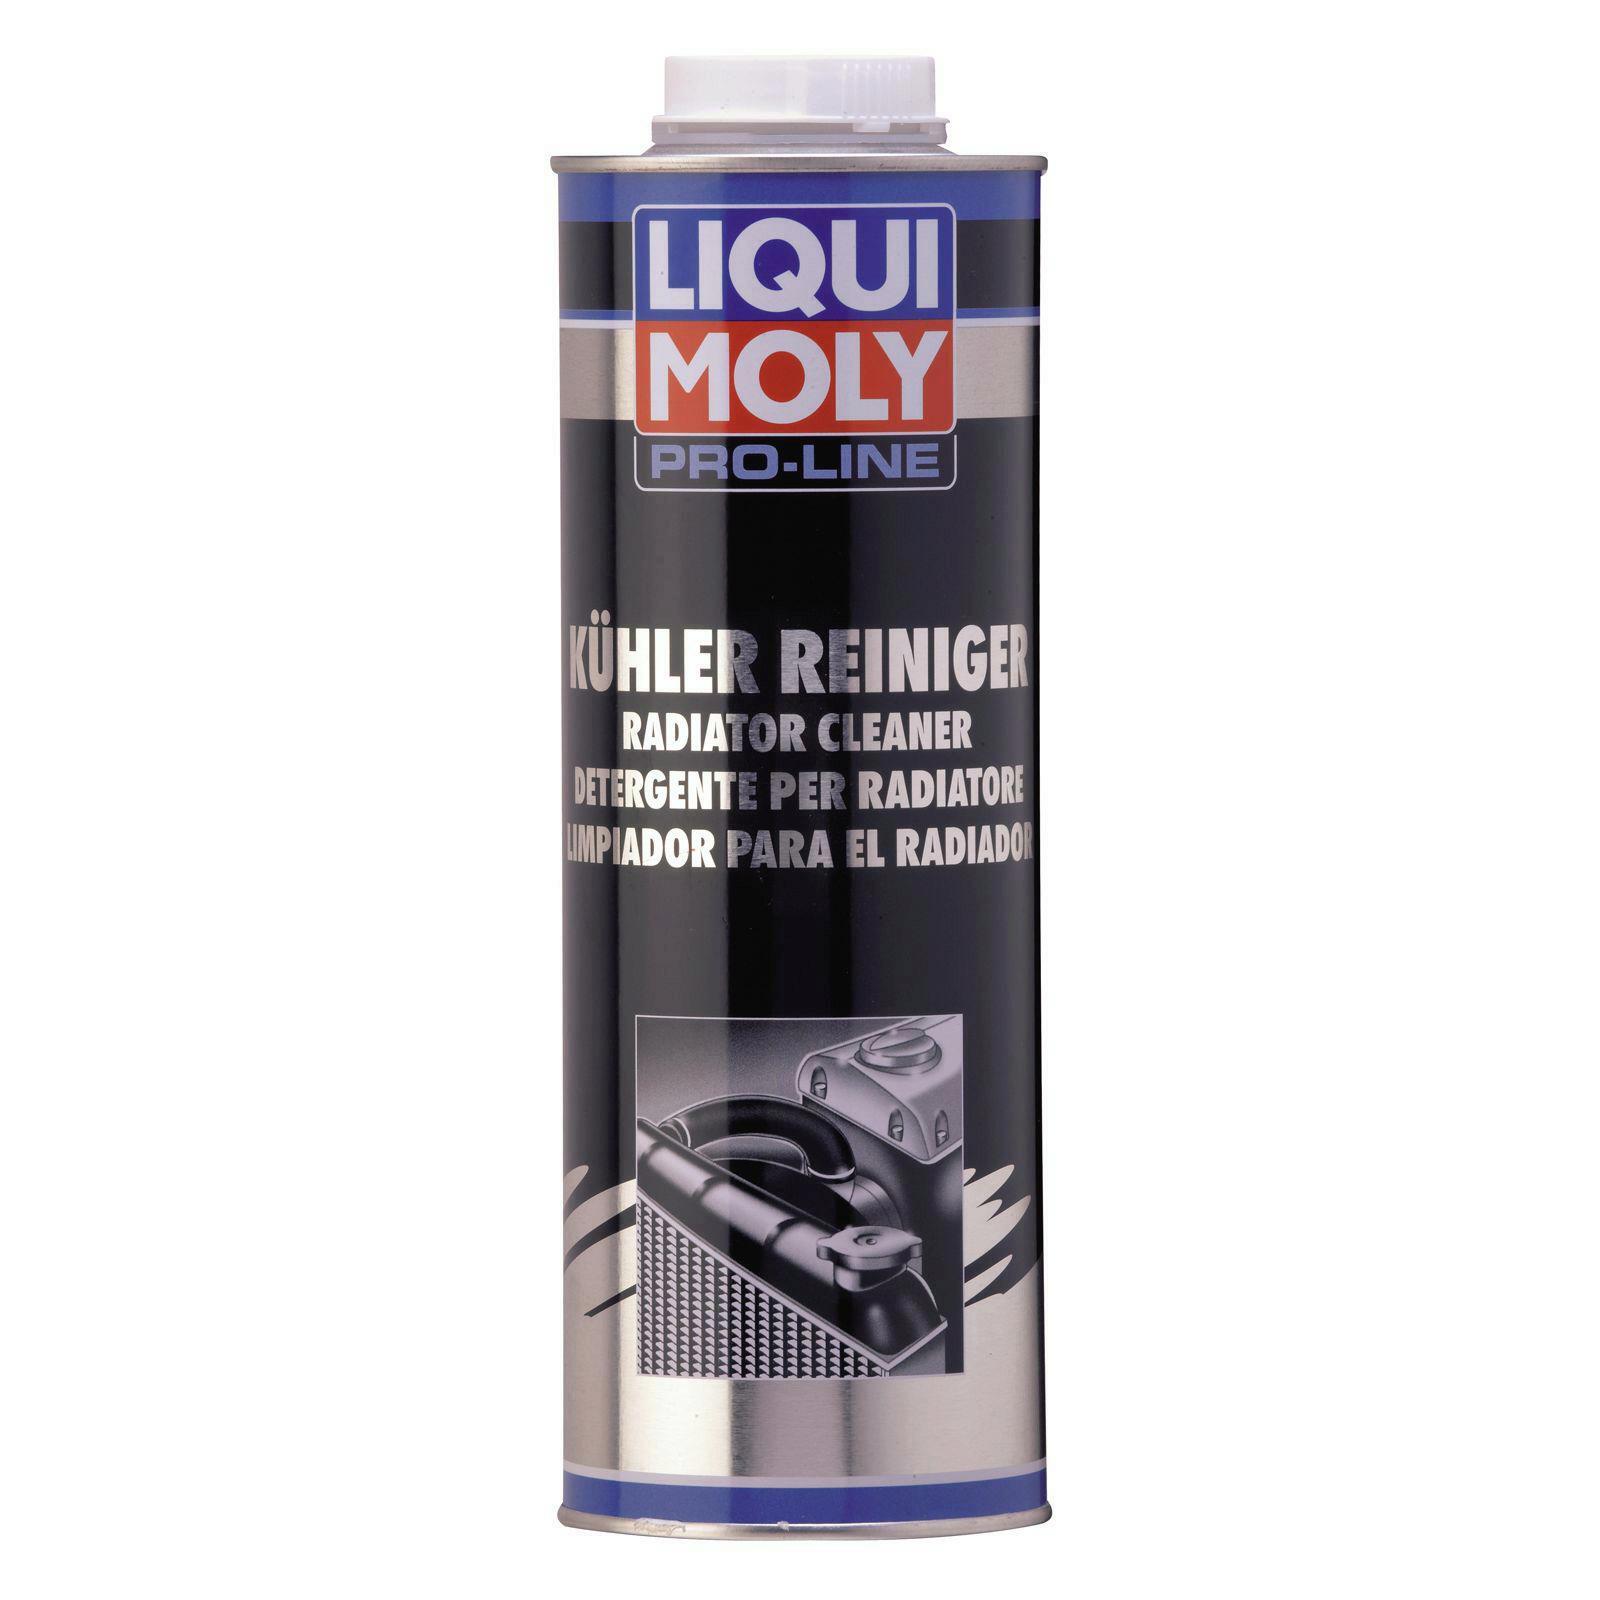 Liqui Moly Pro-Line Kühler-Reiniger 1l